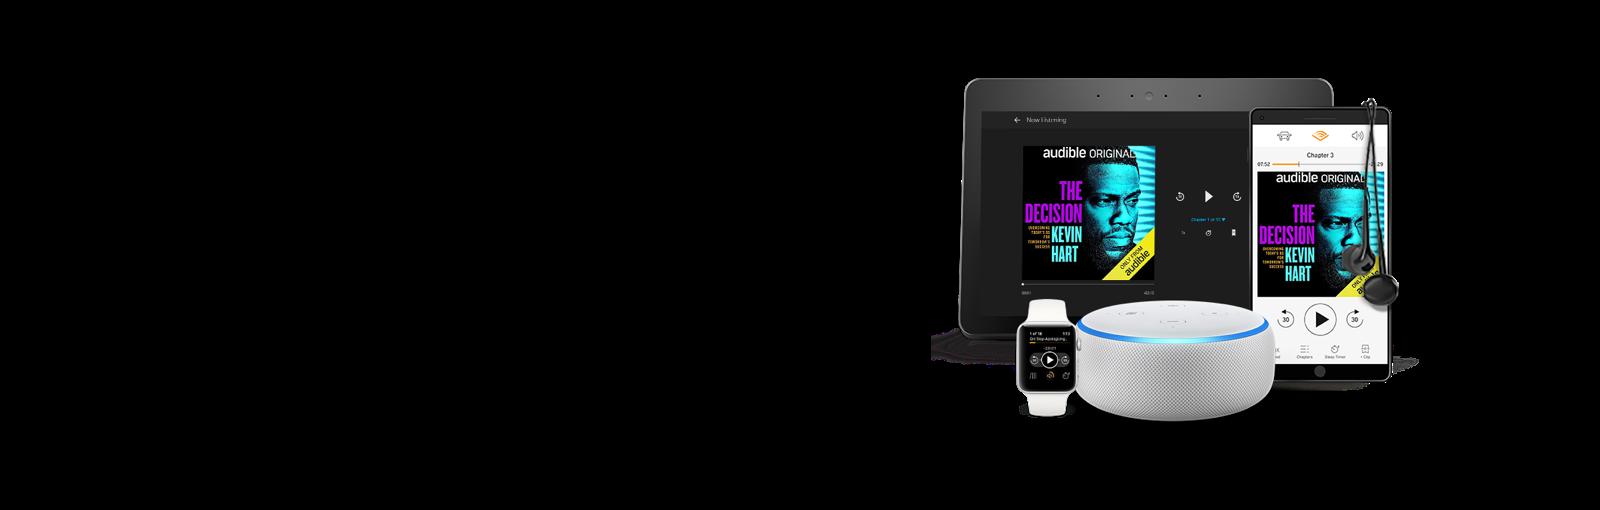 Audible Com Audiobooks Original Audio Free Book With 30 Day Trial